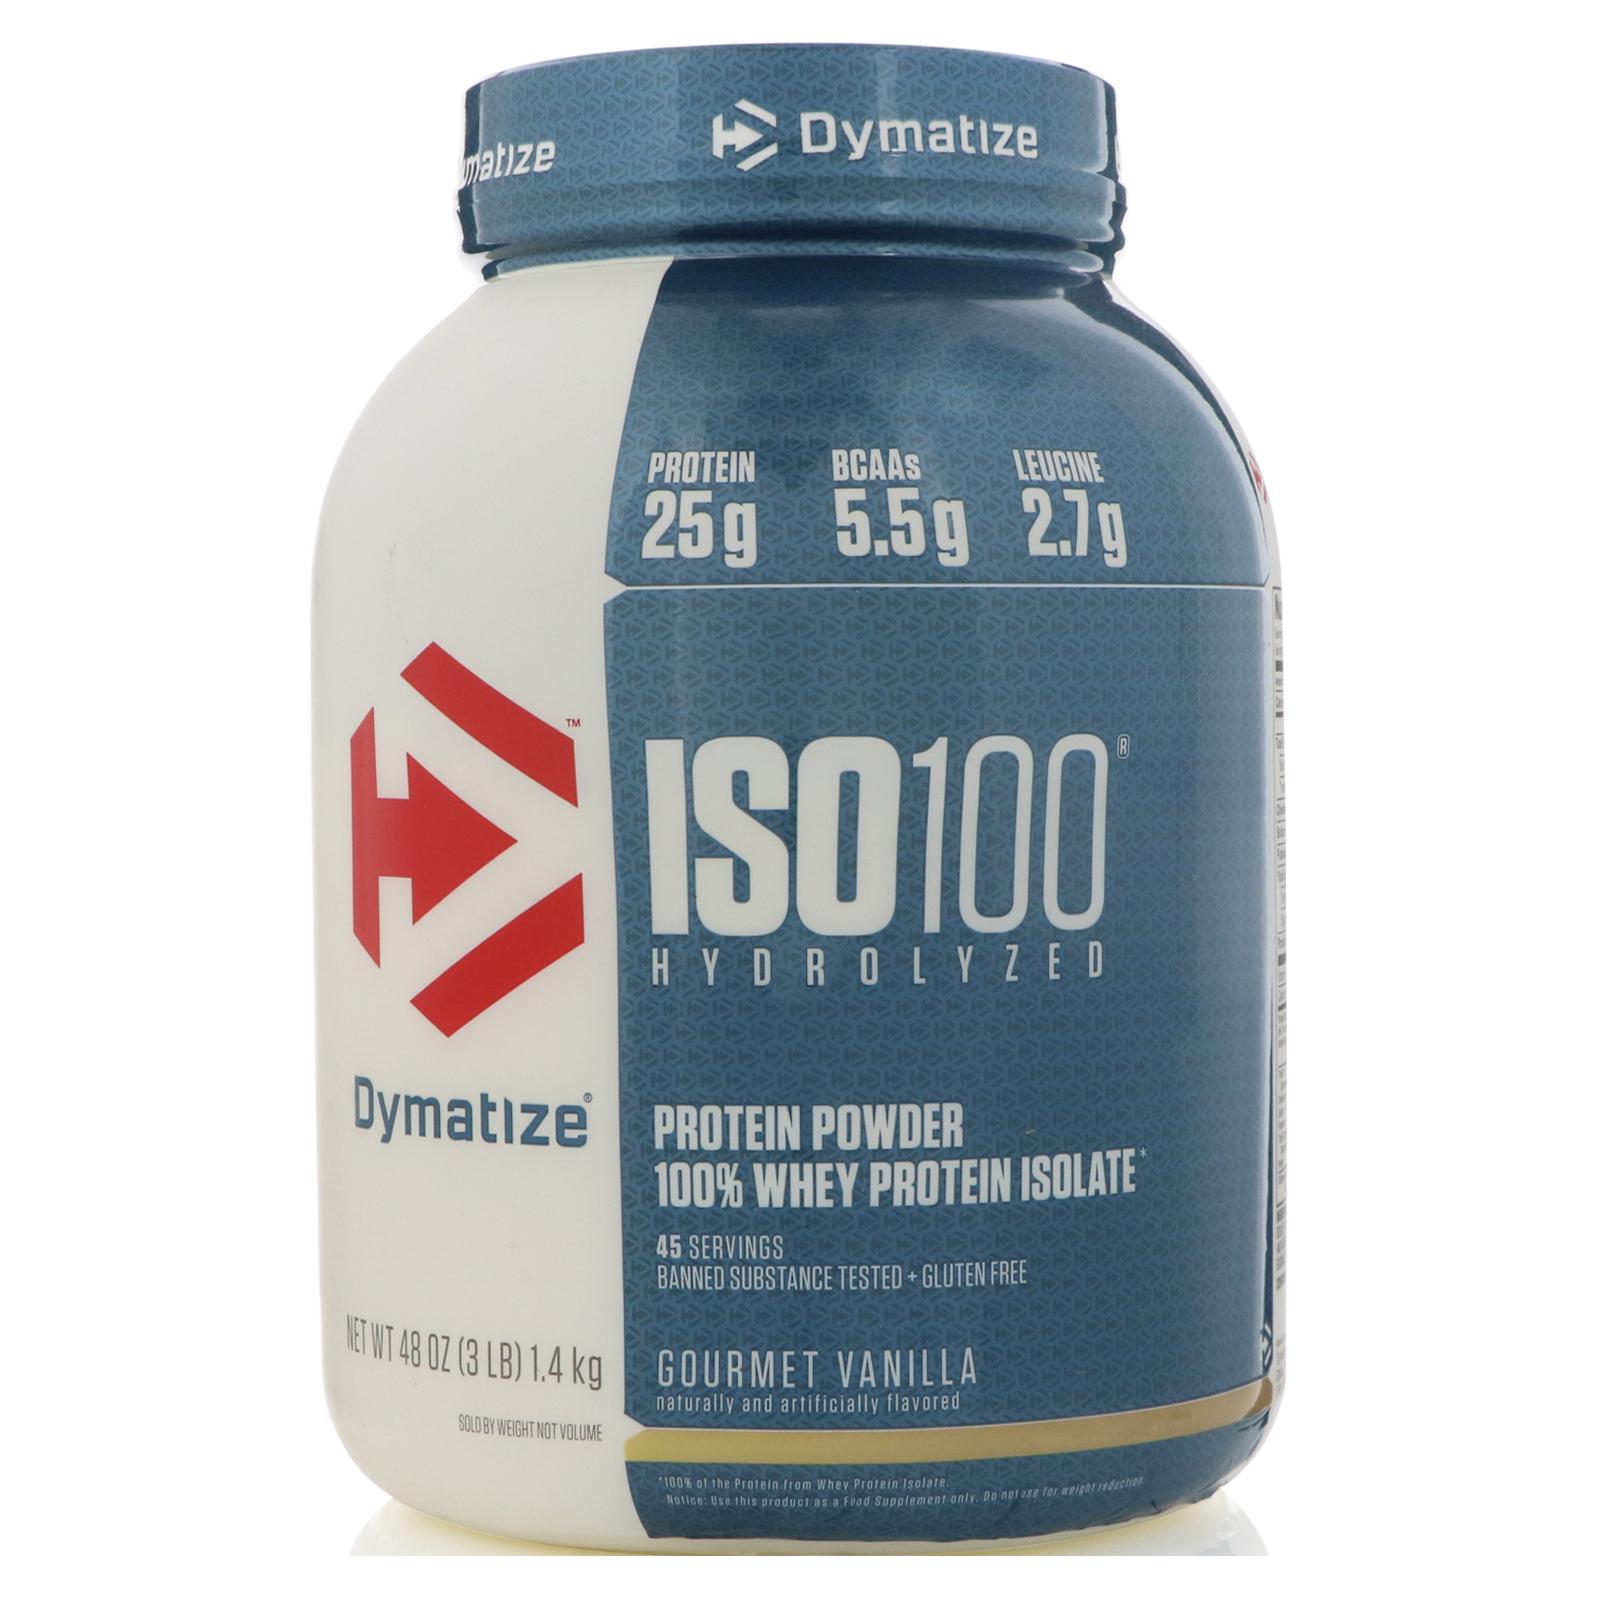 Dymatize Nutrition, ISO100 Hydrolyzed, 100% Whey Protein Isolate, Gourmet Vanilla, 3 lb (1.4 kg)